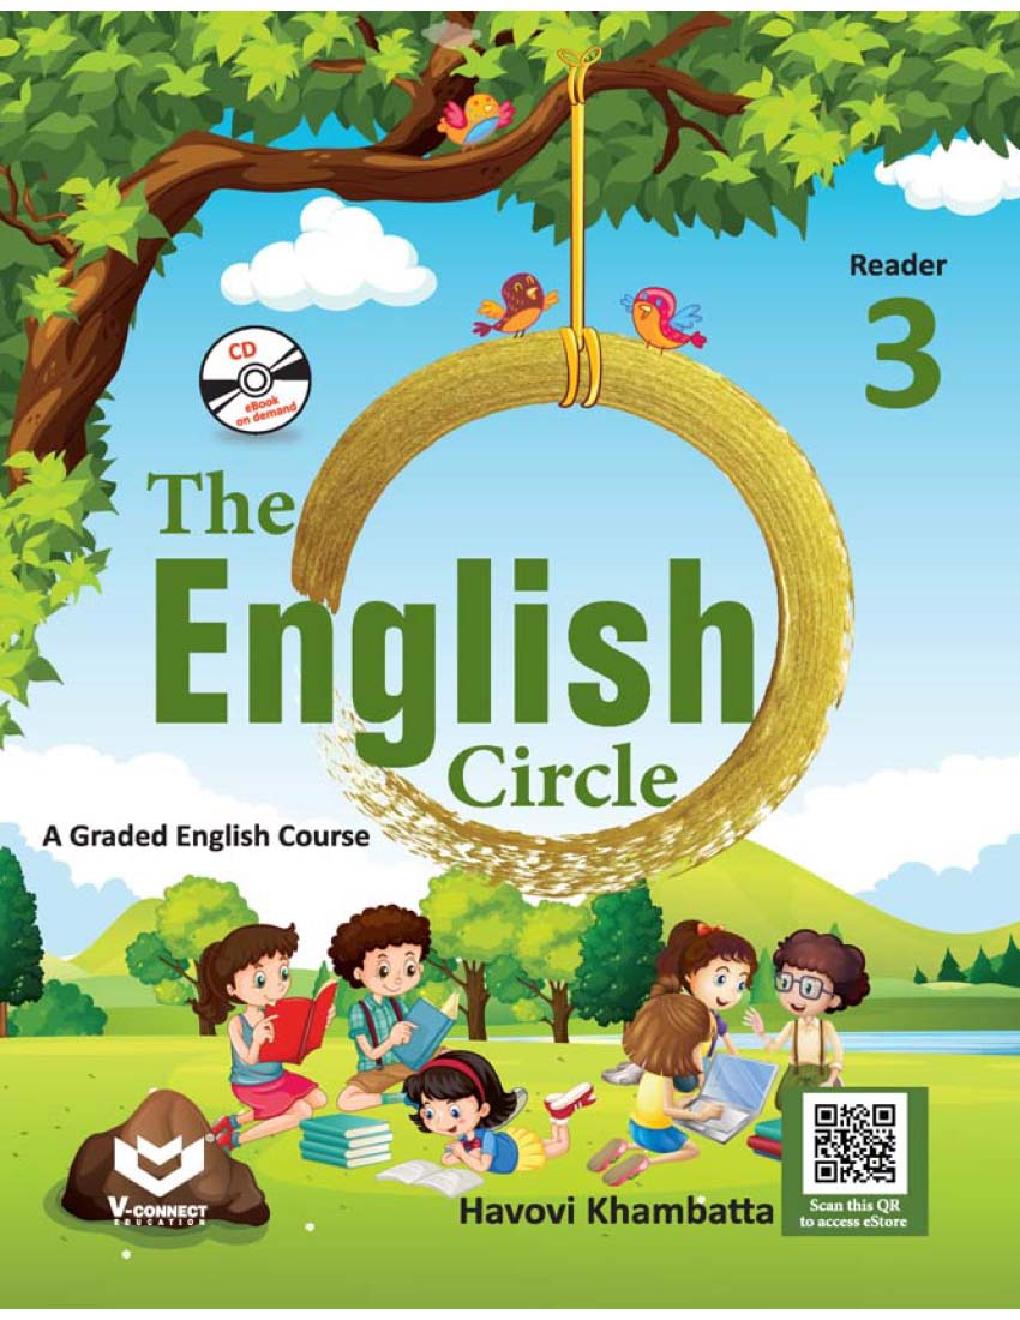 English Textbook Form 3 Pdf